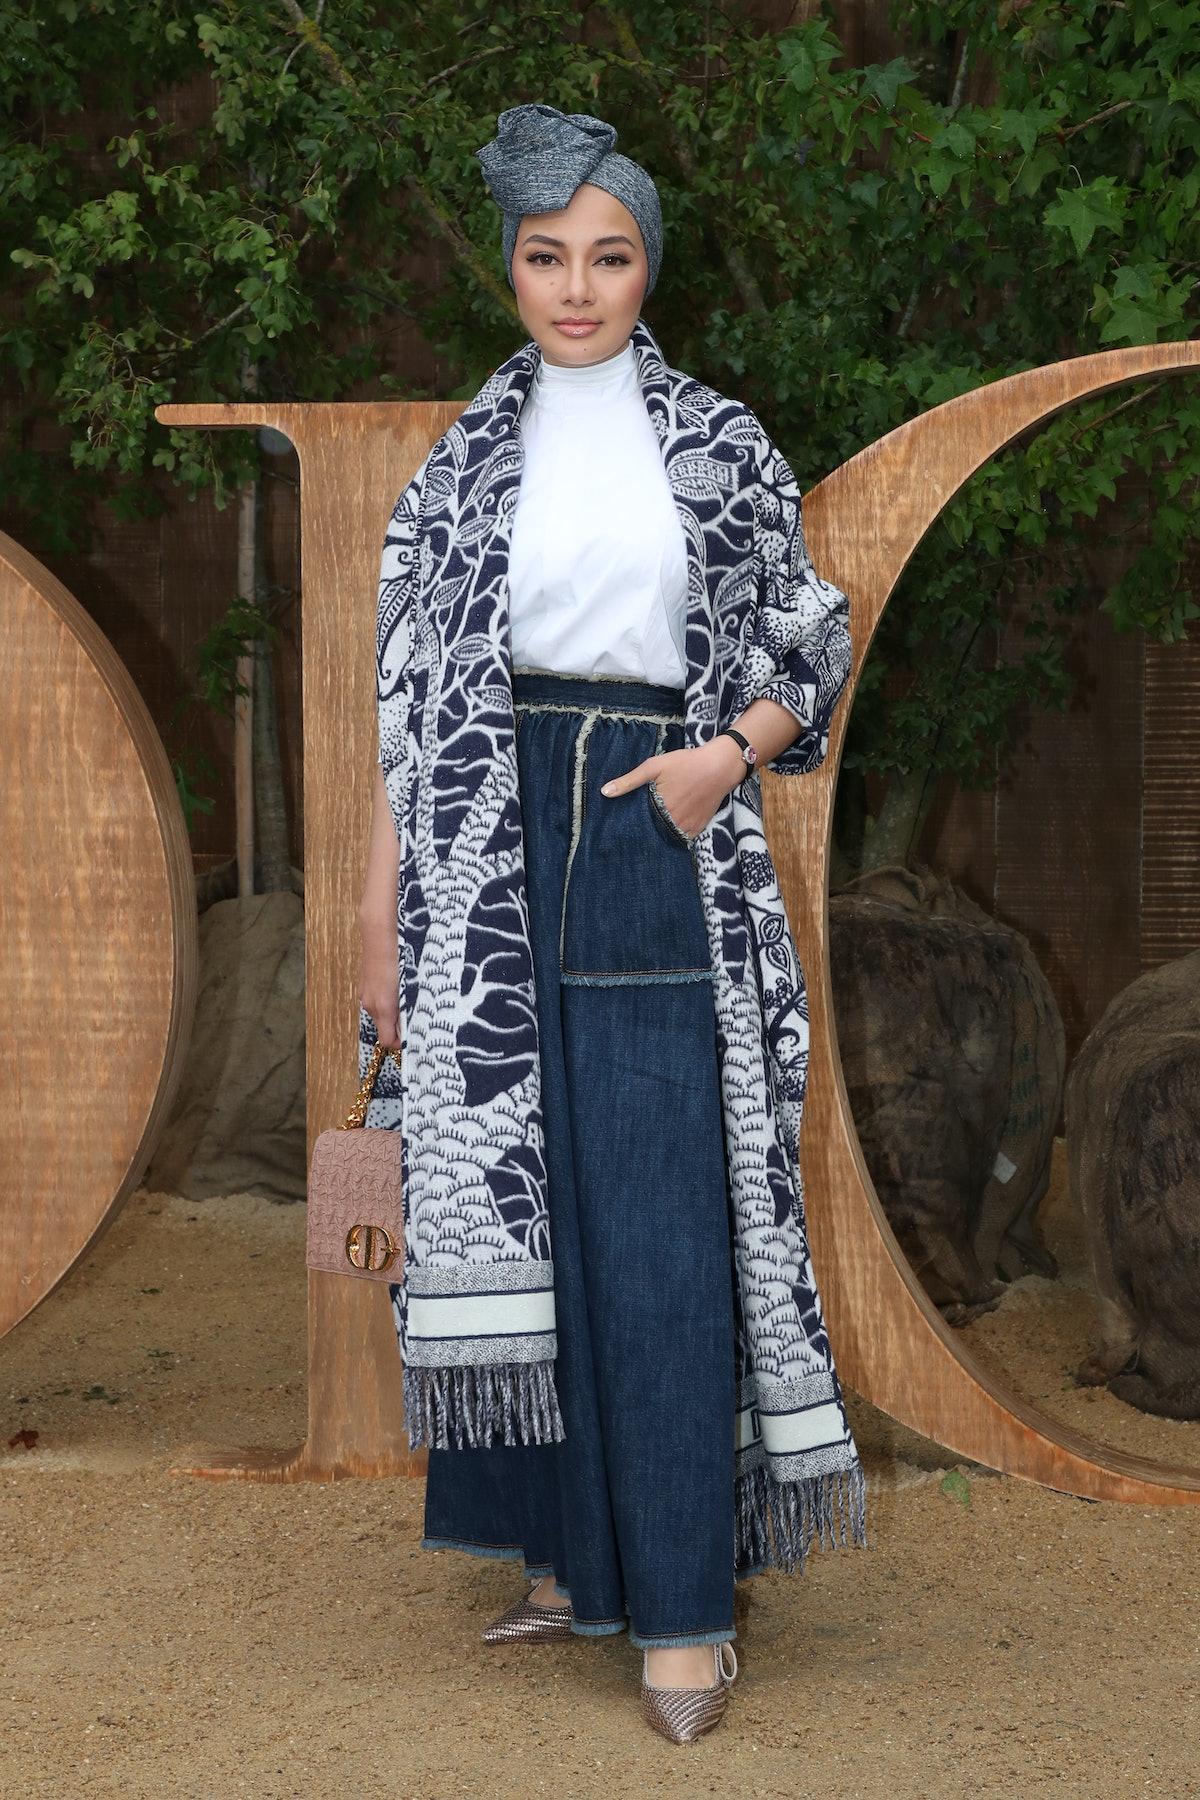 Christian Dior : Front Row -  Paris Fashion Week - Womenswear Spring Summer 2020